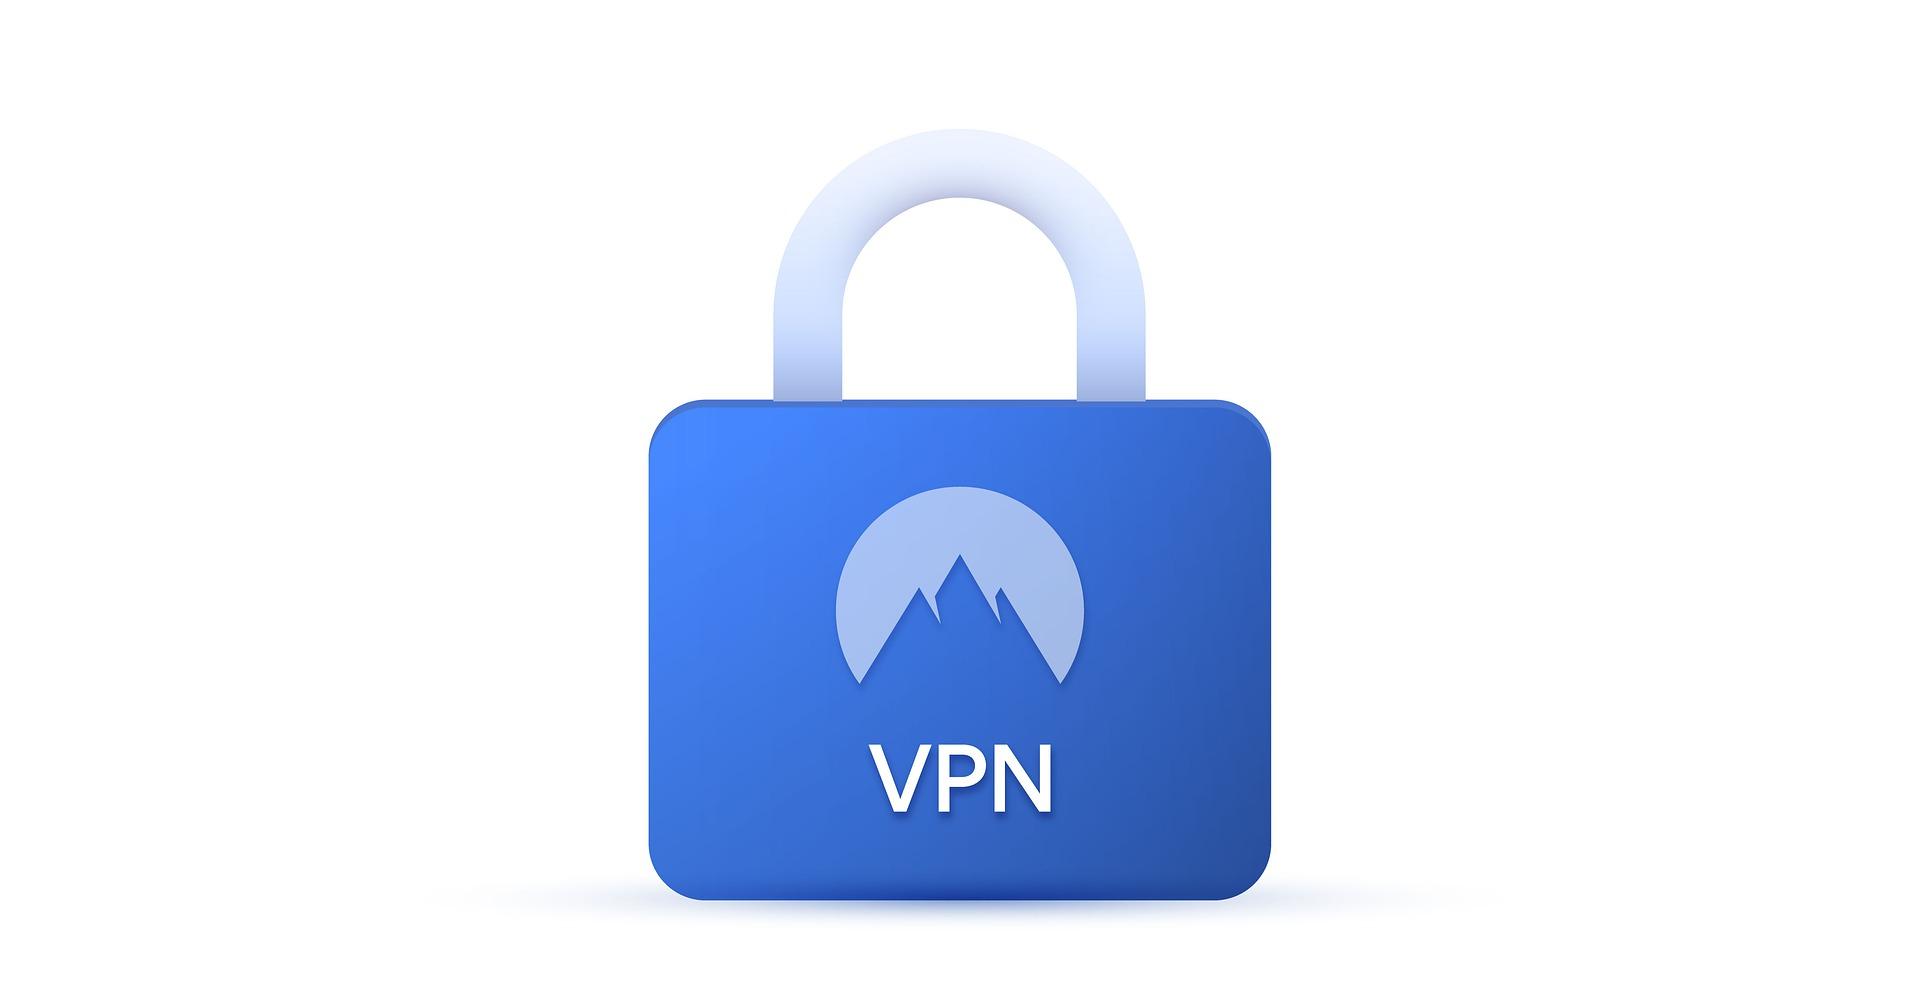 Forse toename van publiek benaderbare RDP- en VPN-systemen